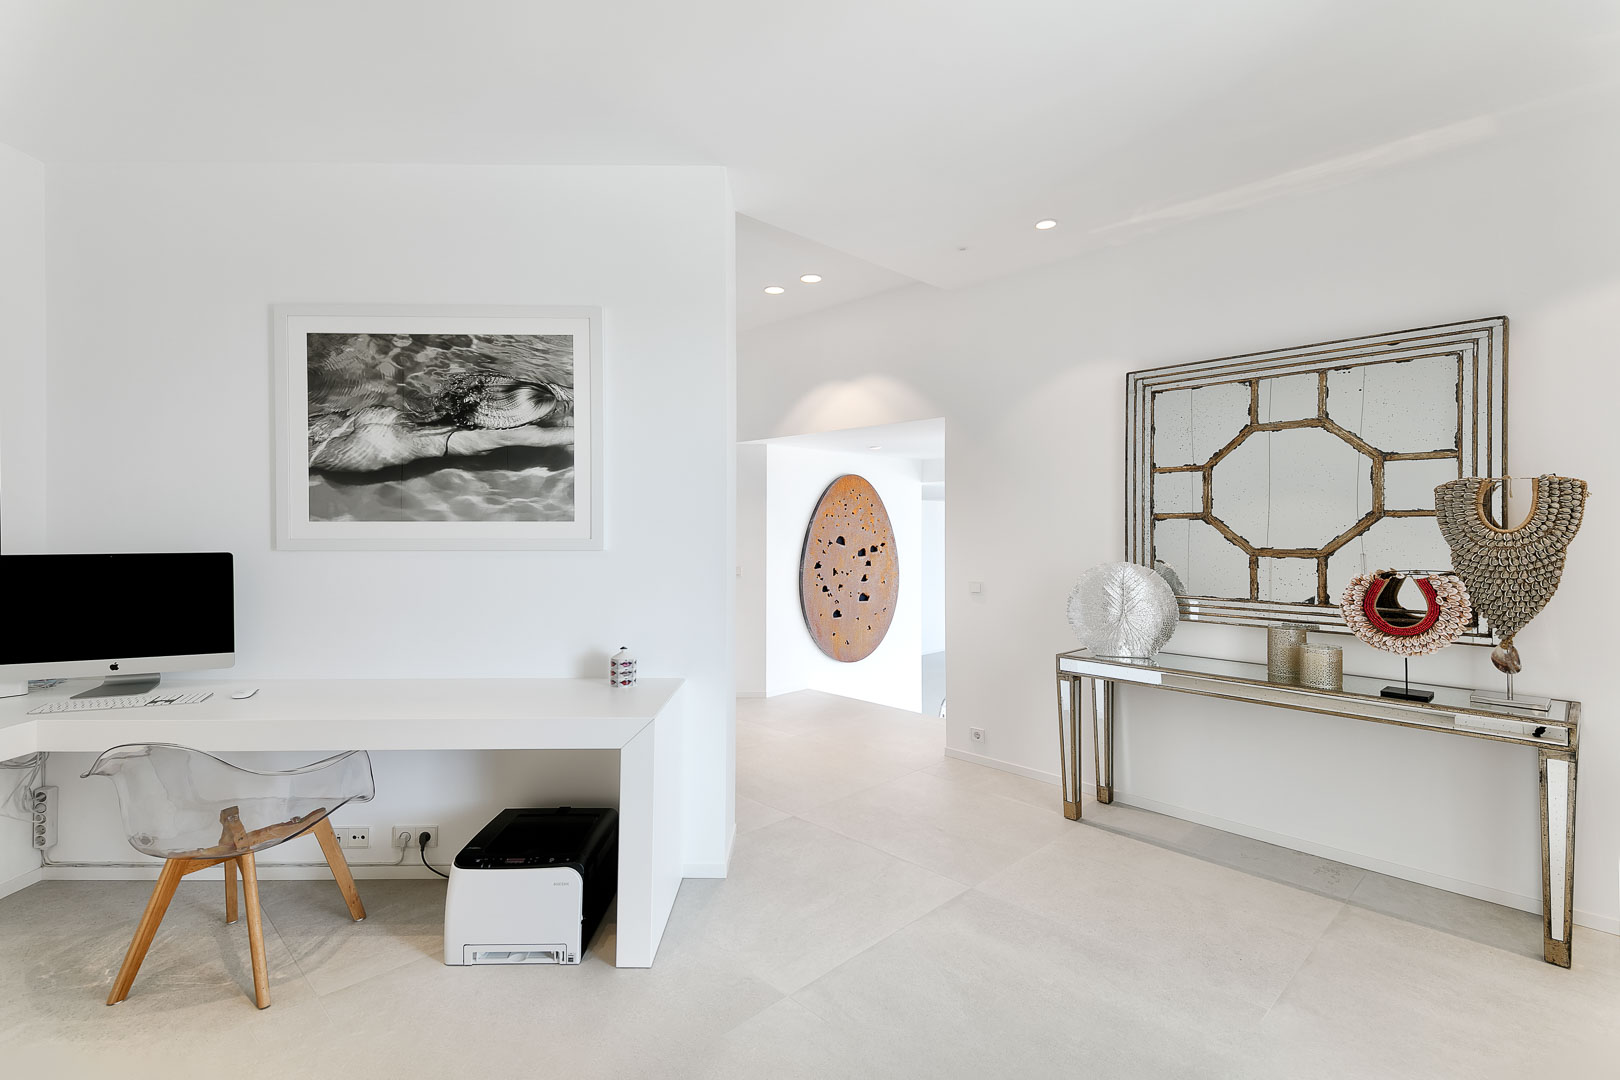 fotografía profesional interior real estate villa privada de recibidor en Ibiza